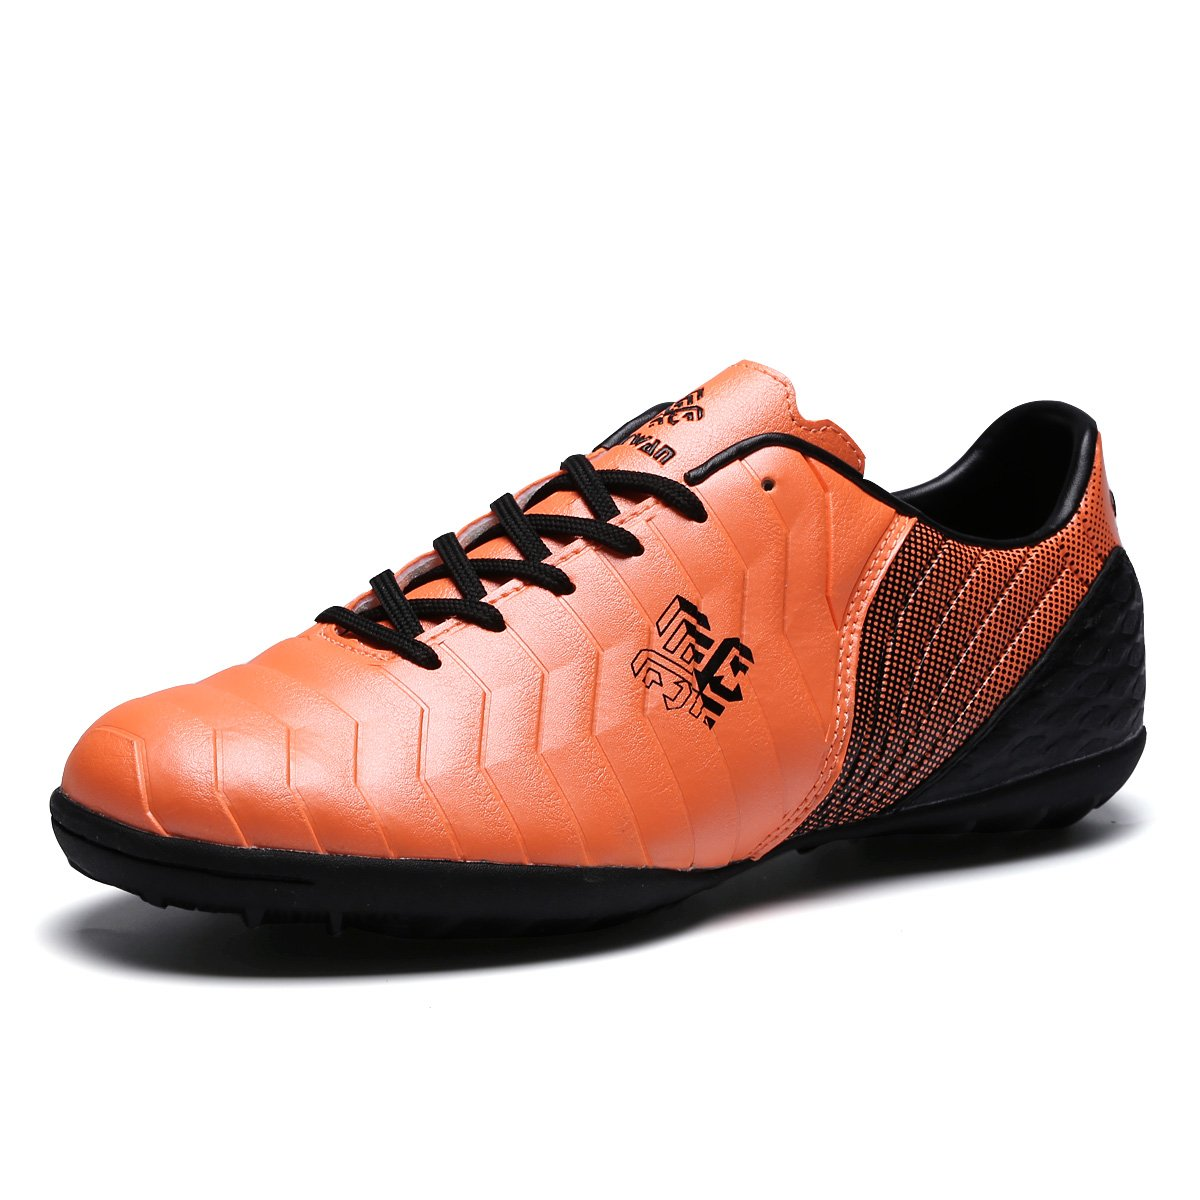 Toptak Herren Niedrig-Top Fußballschuhe Professionelle Trainers Orange Sneakers Männer